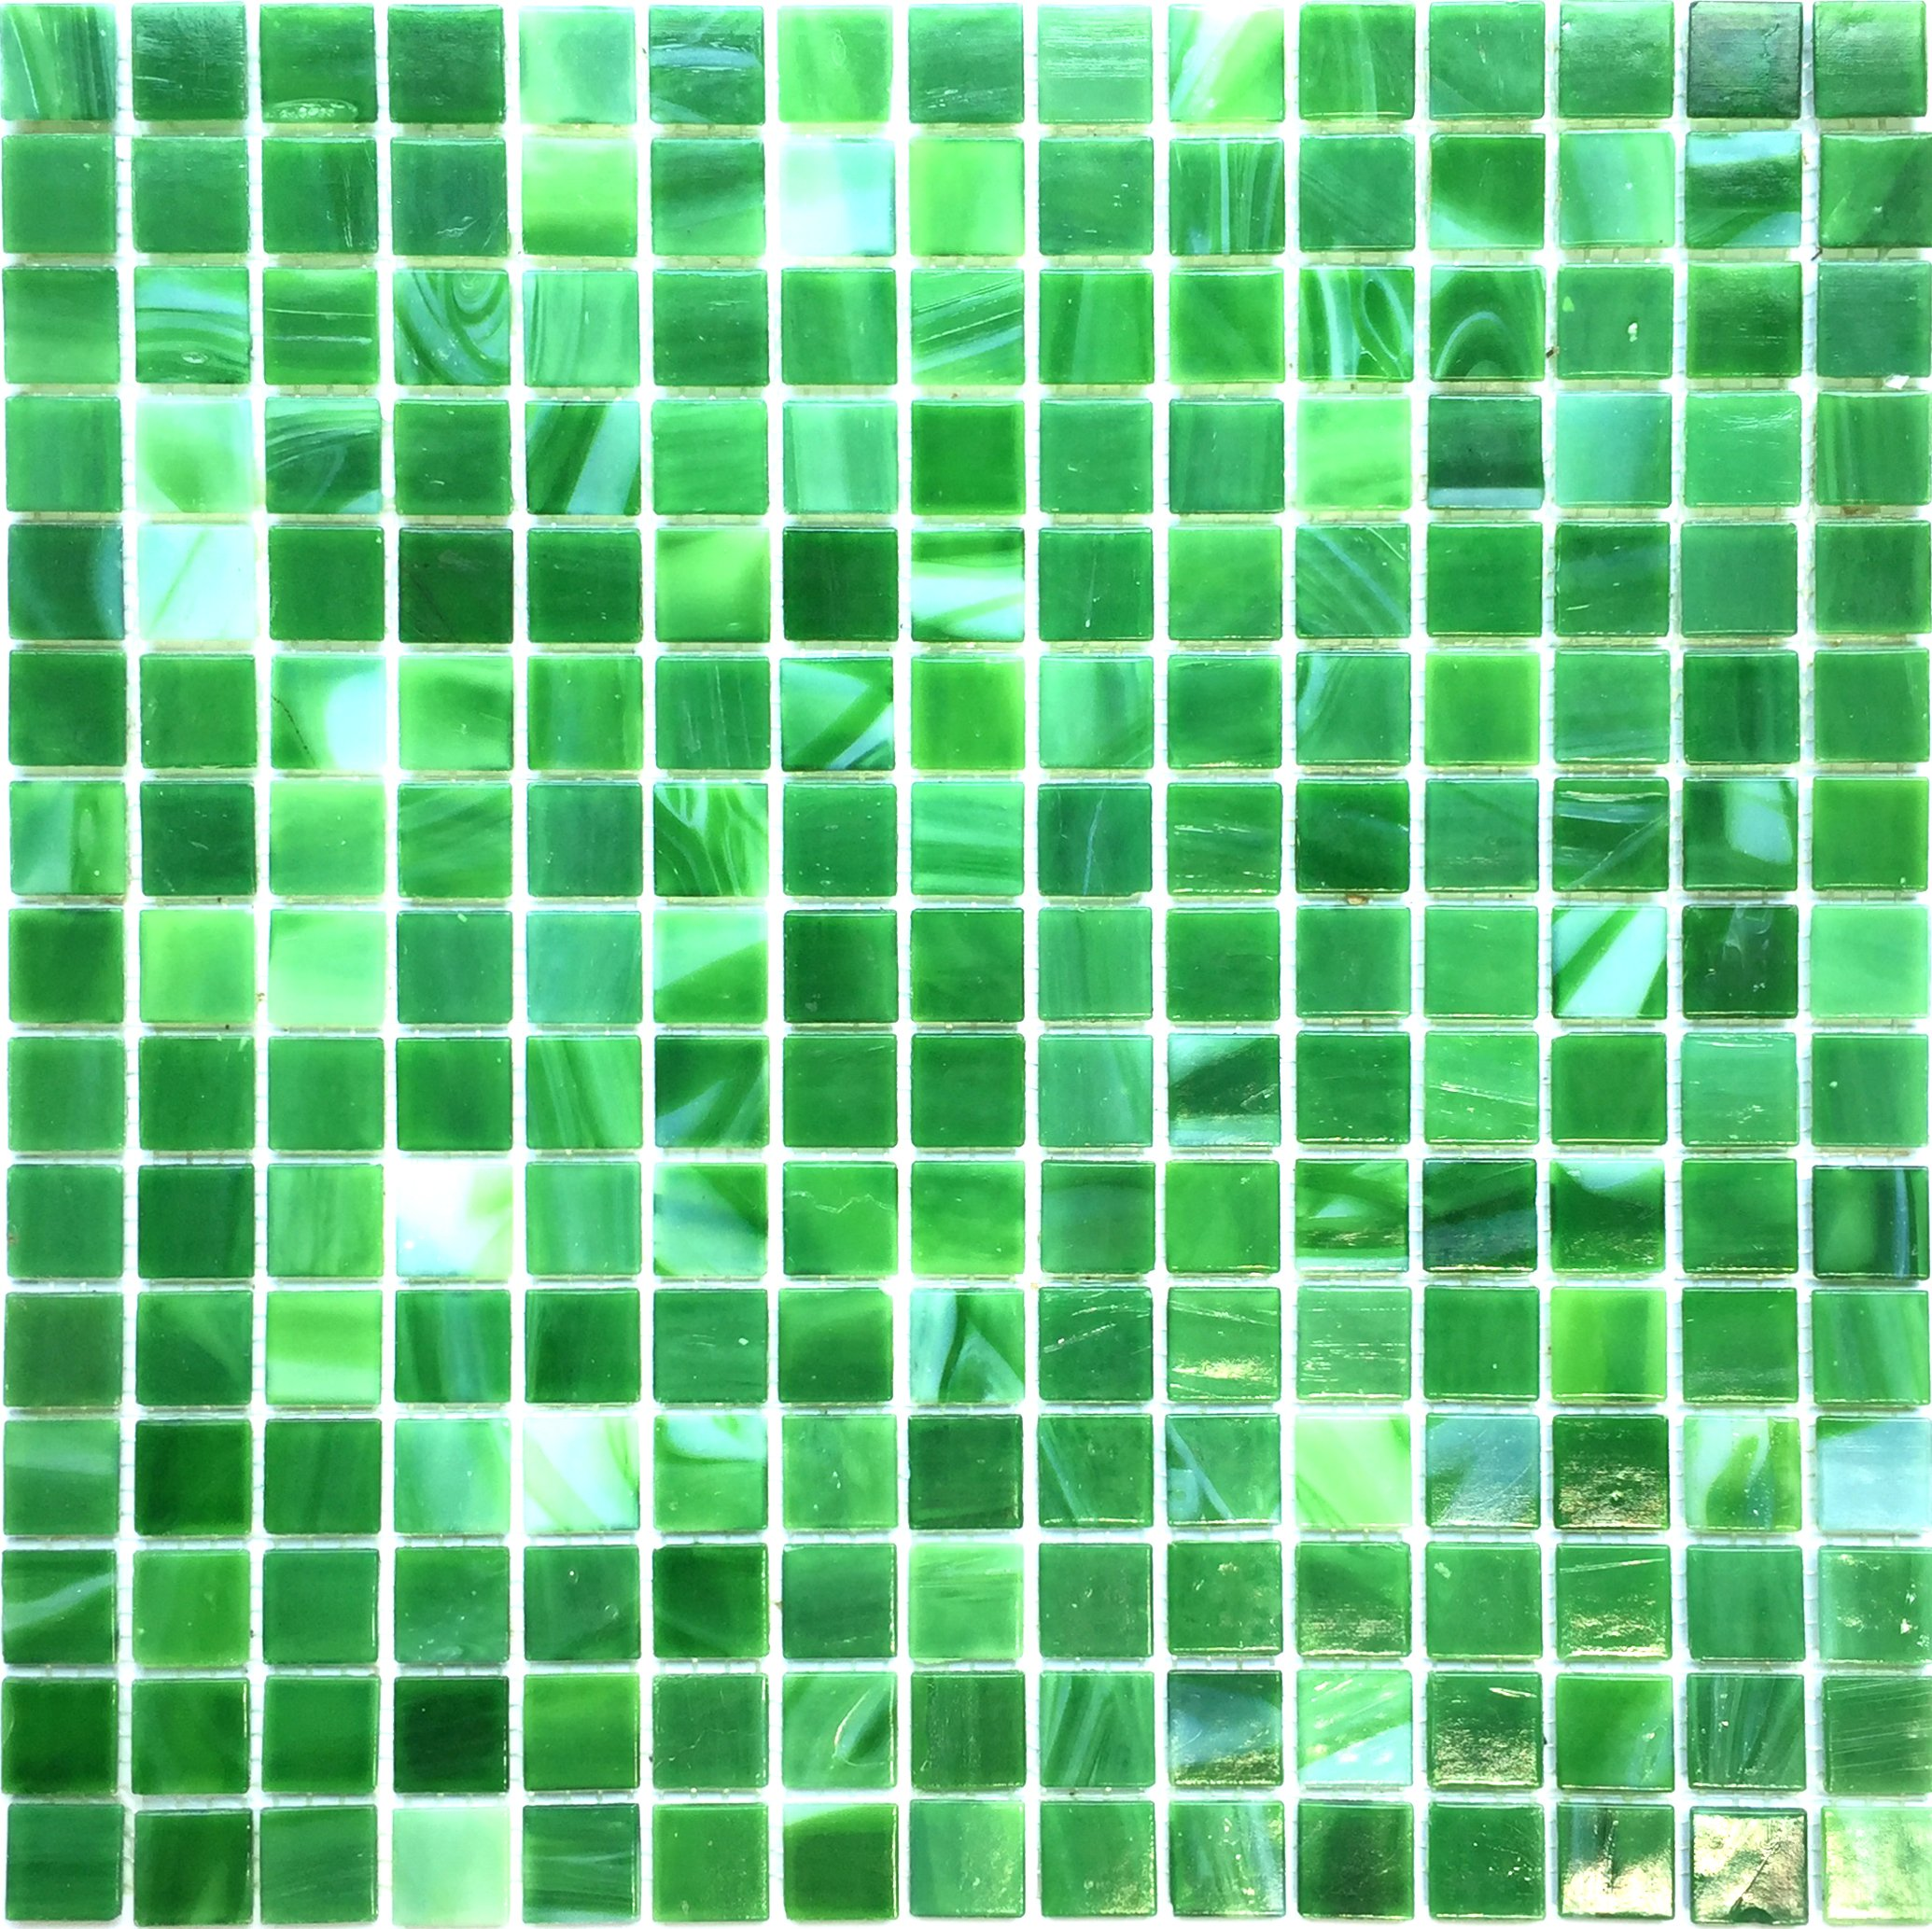 Hometile Mosaic Glass Mosaic Tile/backsplash Tile for Kitchen/Sticker Tile/Bathroom Tile/Kitchen Tiles for Wall,Mosaic Tiles (10sheet, Green)